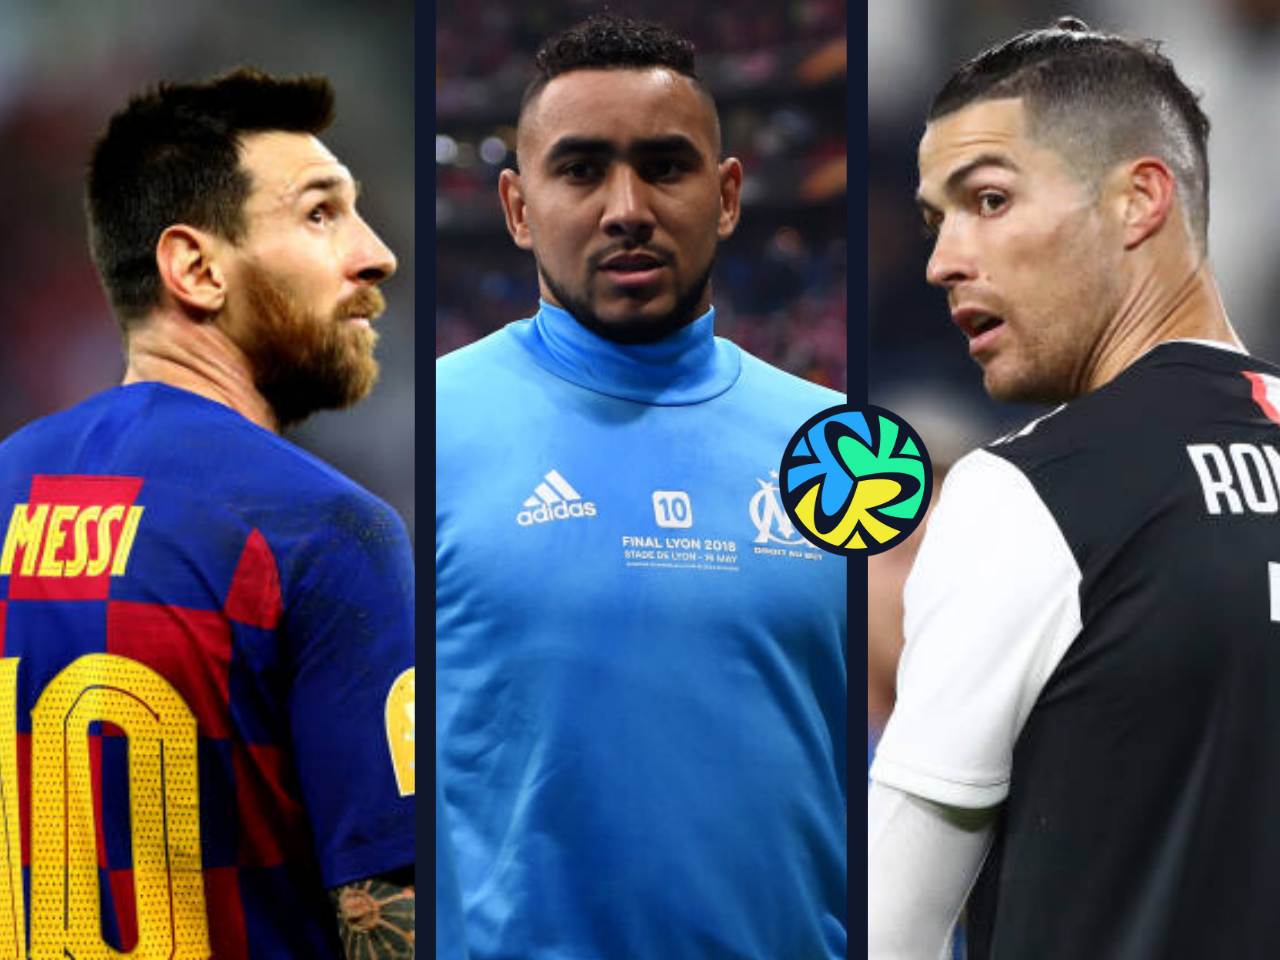 Lionel Messi of Barcelona, Dimitri Payet of Marseille, Cristiano Ronaldo of Juventus